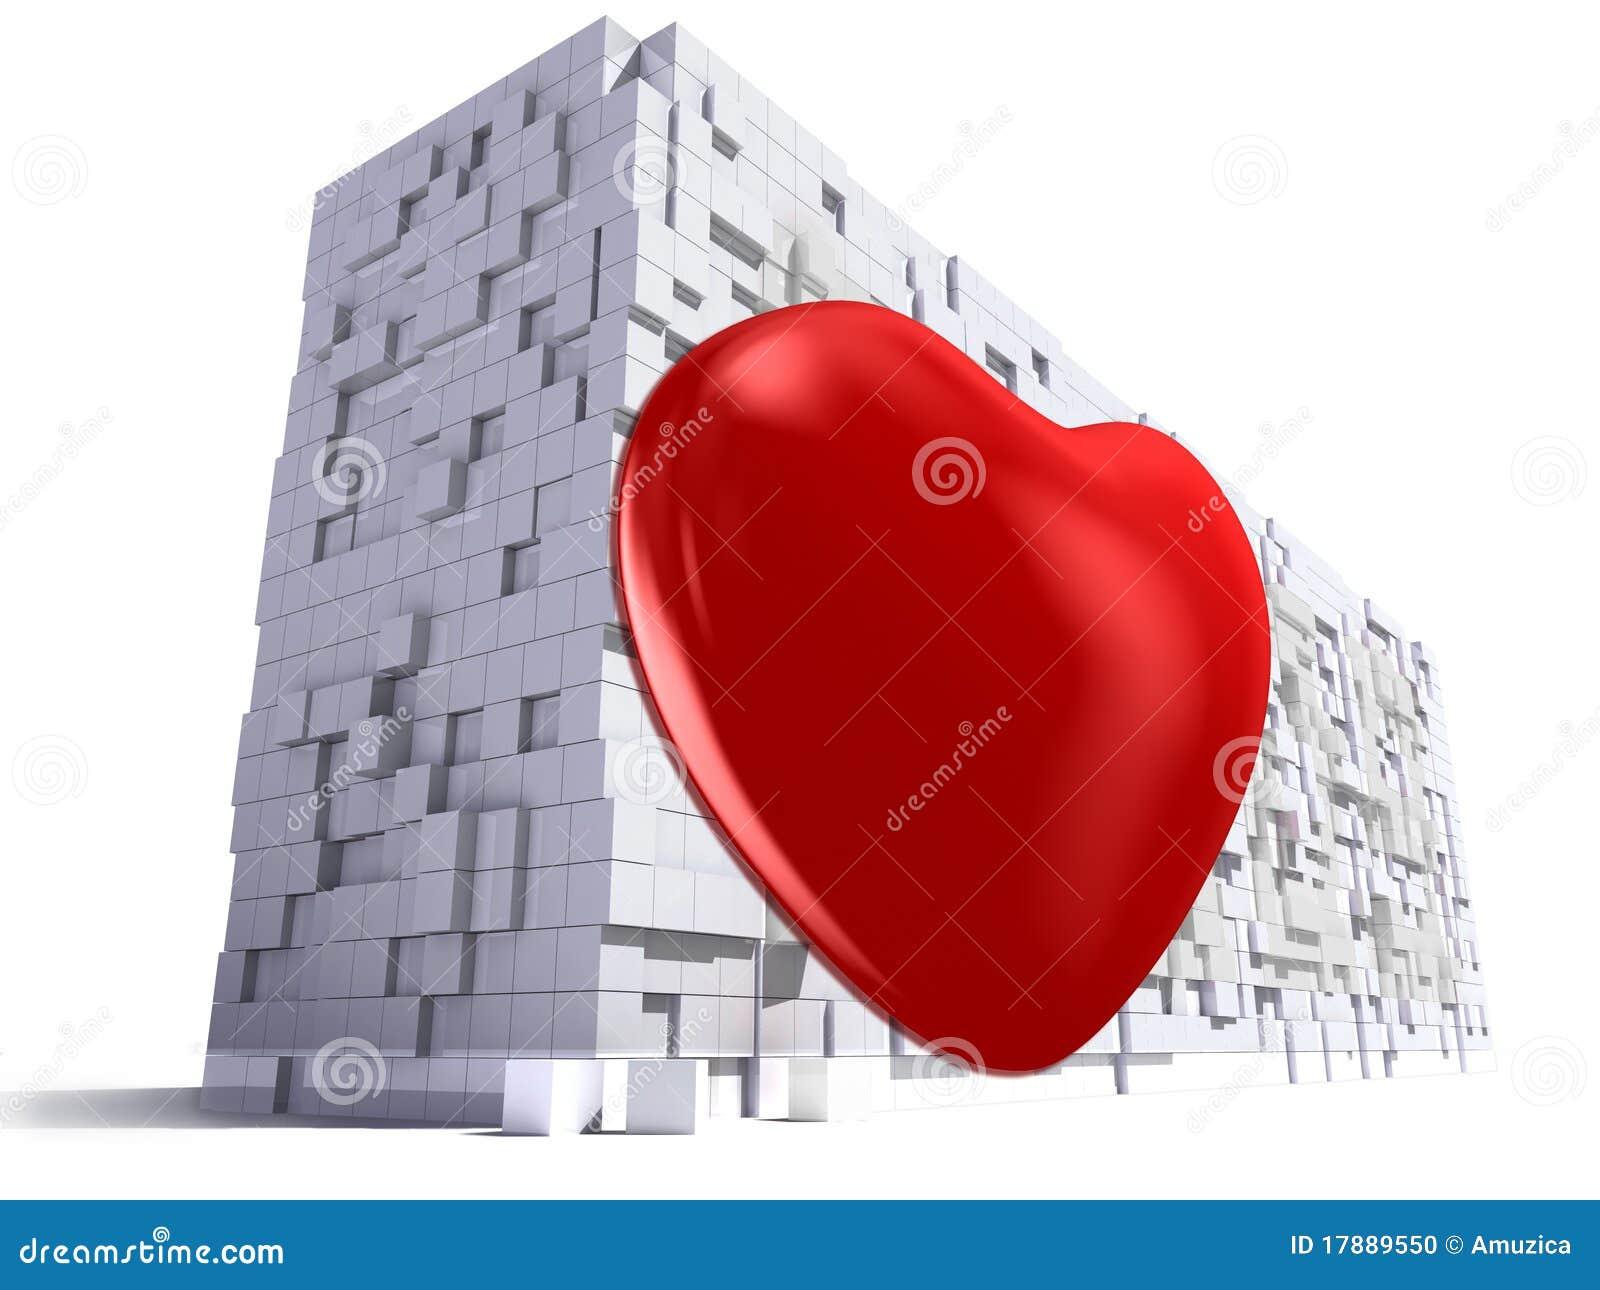 Heart On Wall Stock Photo - Image: 17889550